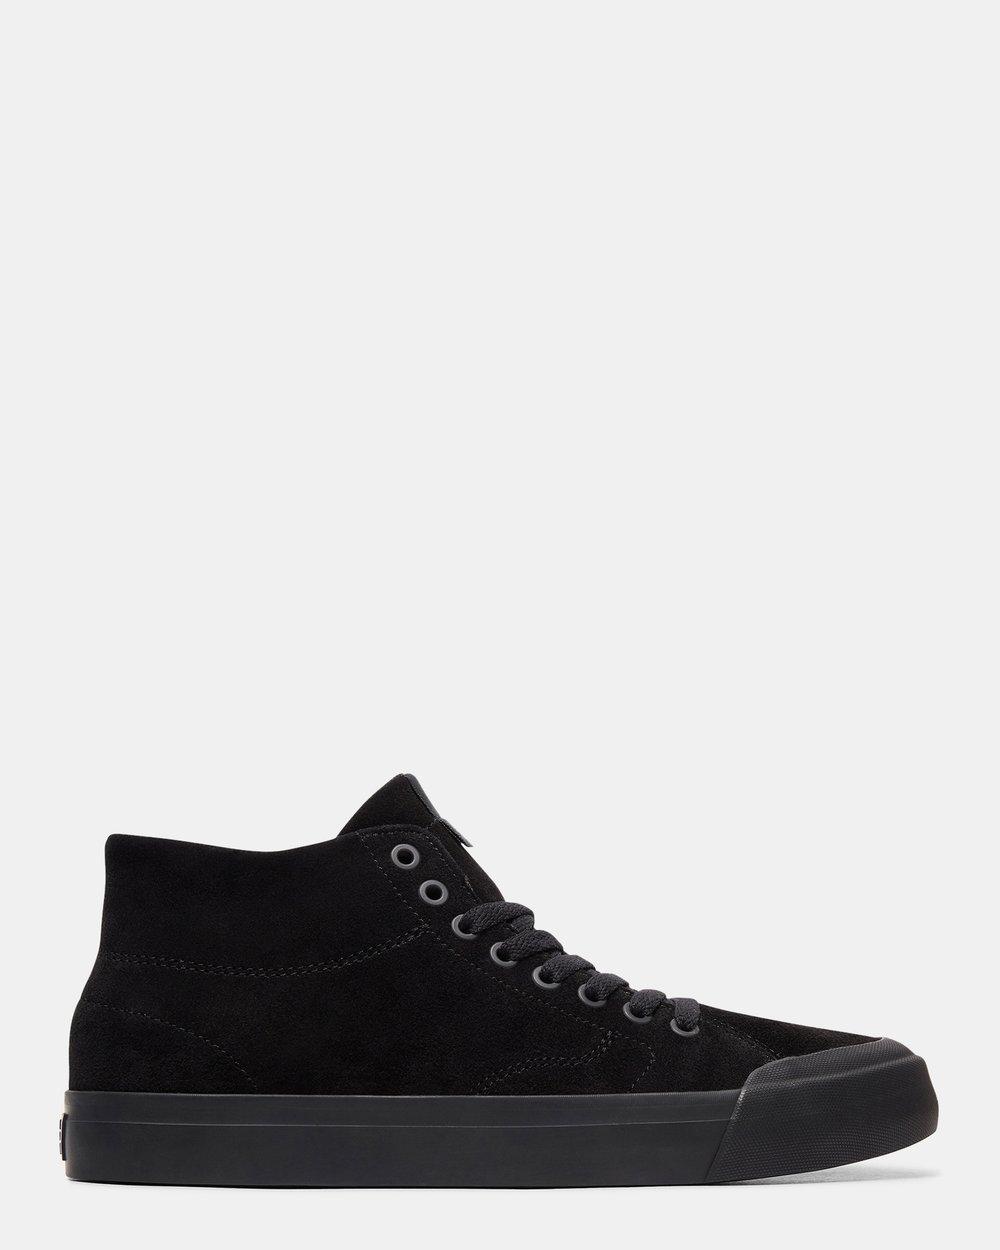 1a62ebb1dc Mens Evan Smith Hi Zero Shoe by DC Shoes Online | THE ICONIC | Australia